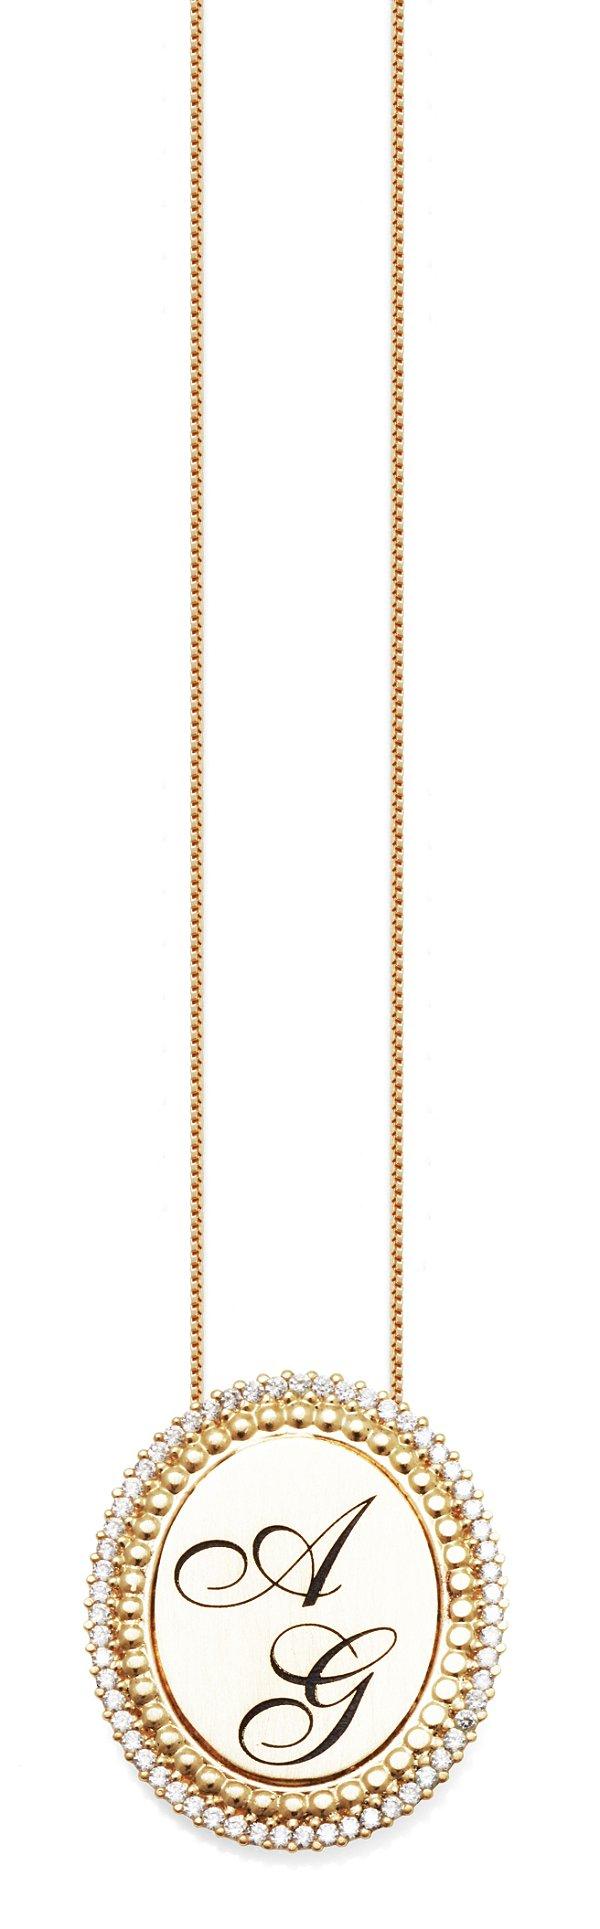 Gargantilha Prata Banho de Ouro Personalizada até 3 Letras Borda Zircônia Branca VD 195